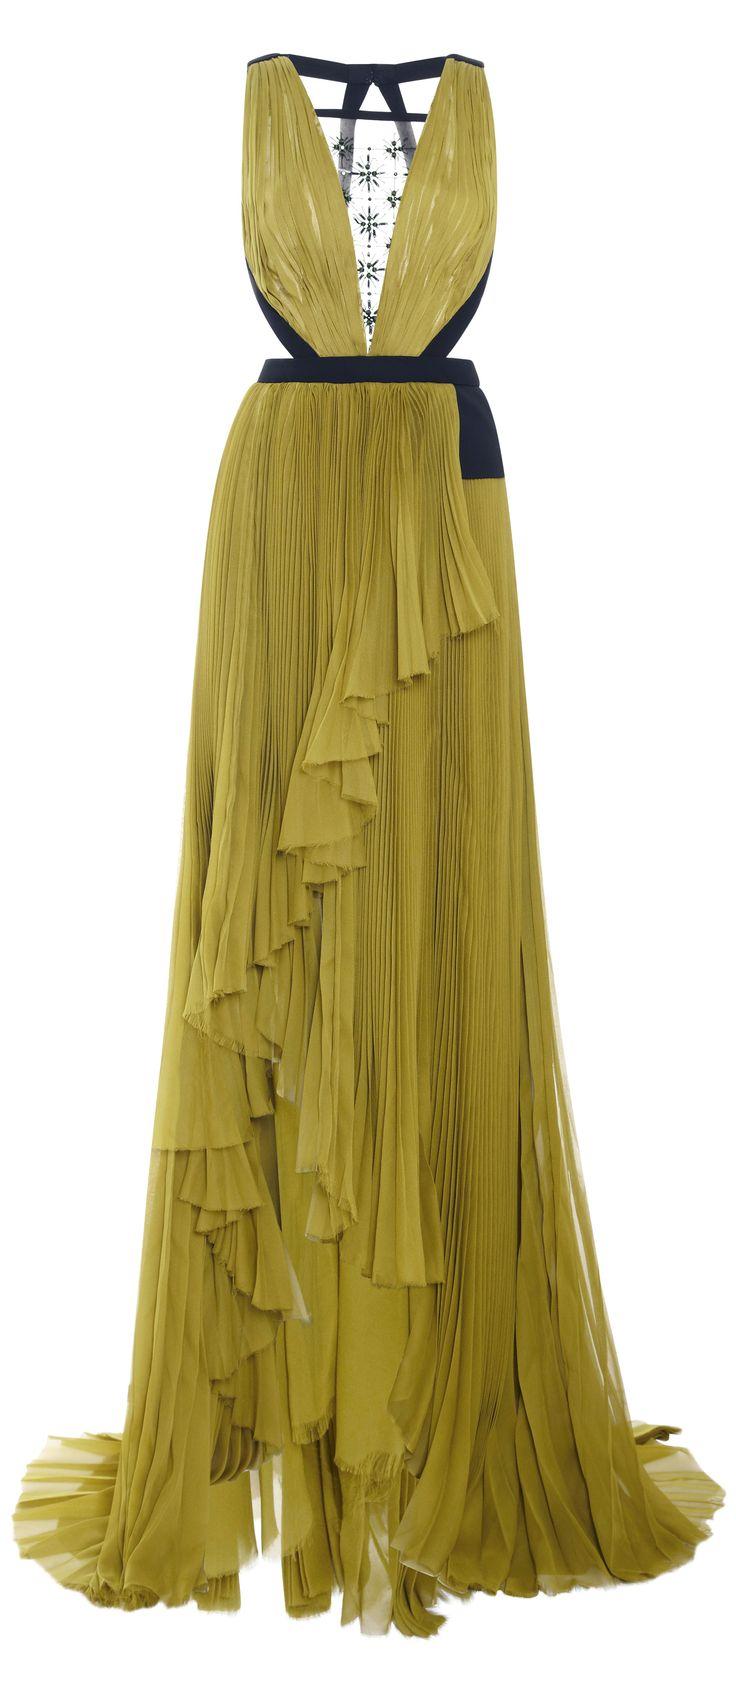 J Mendel gown (OPCION 1 pollera)